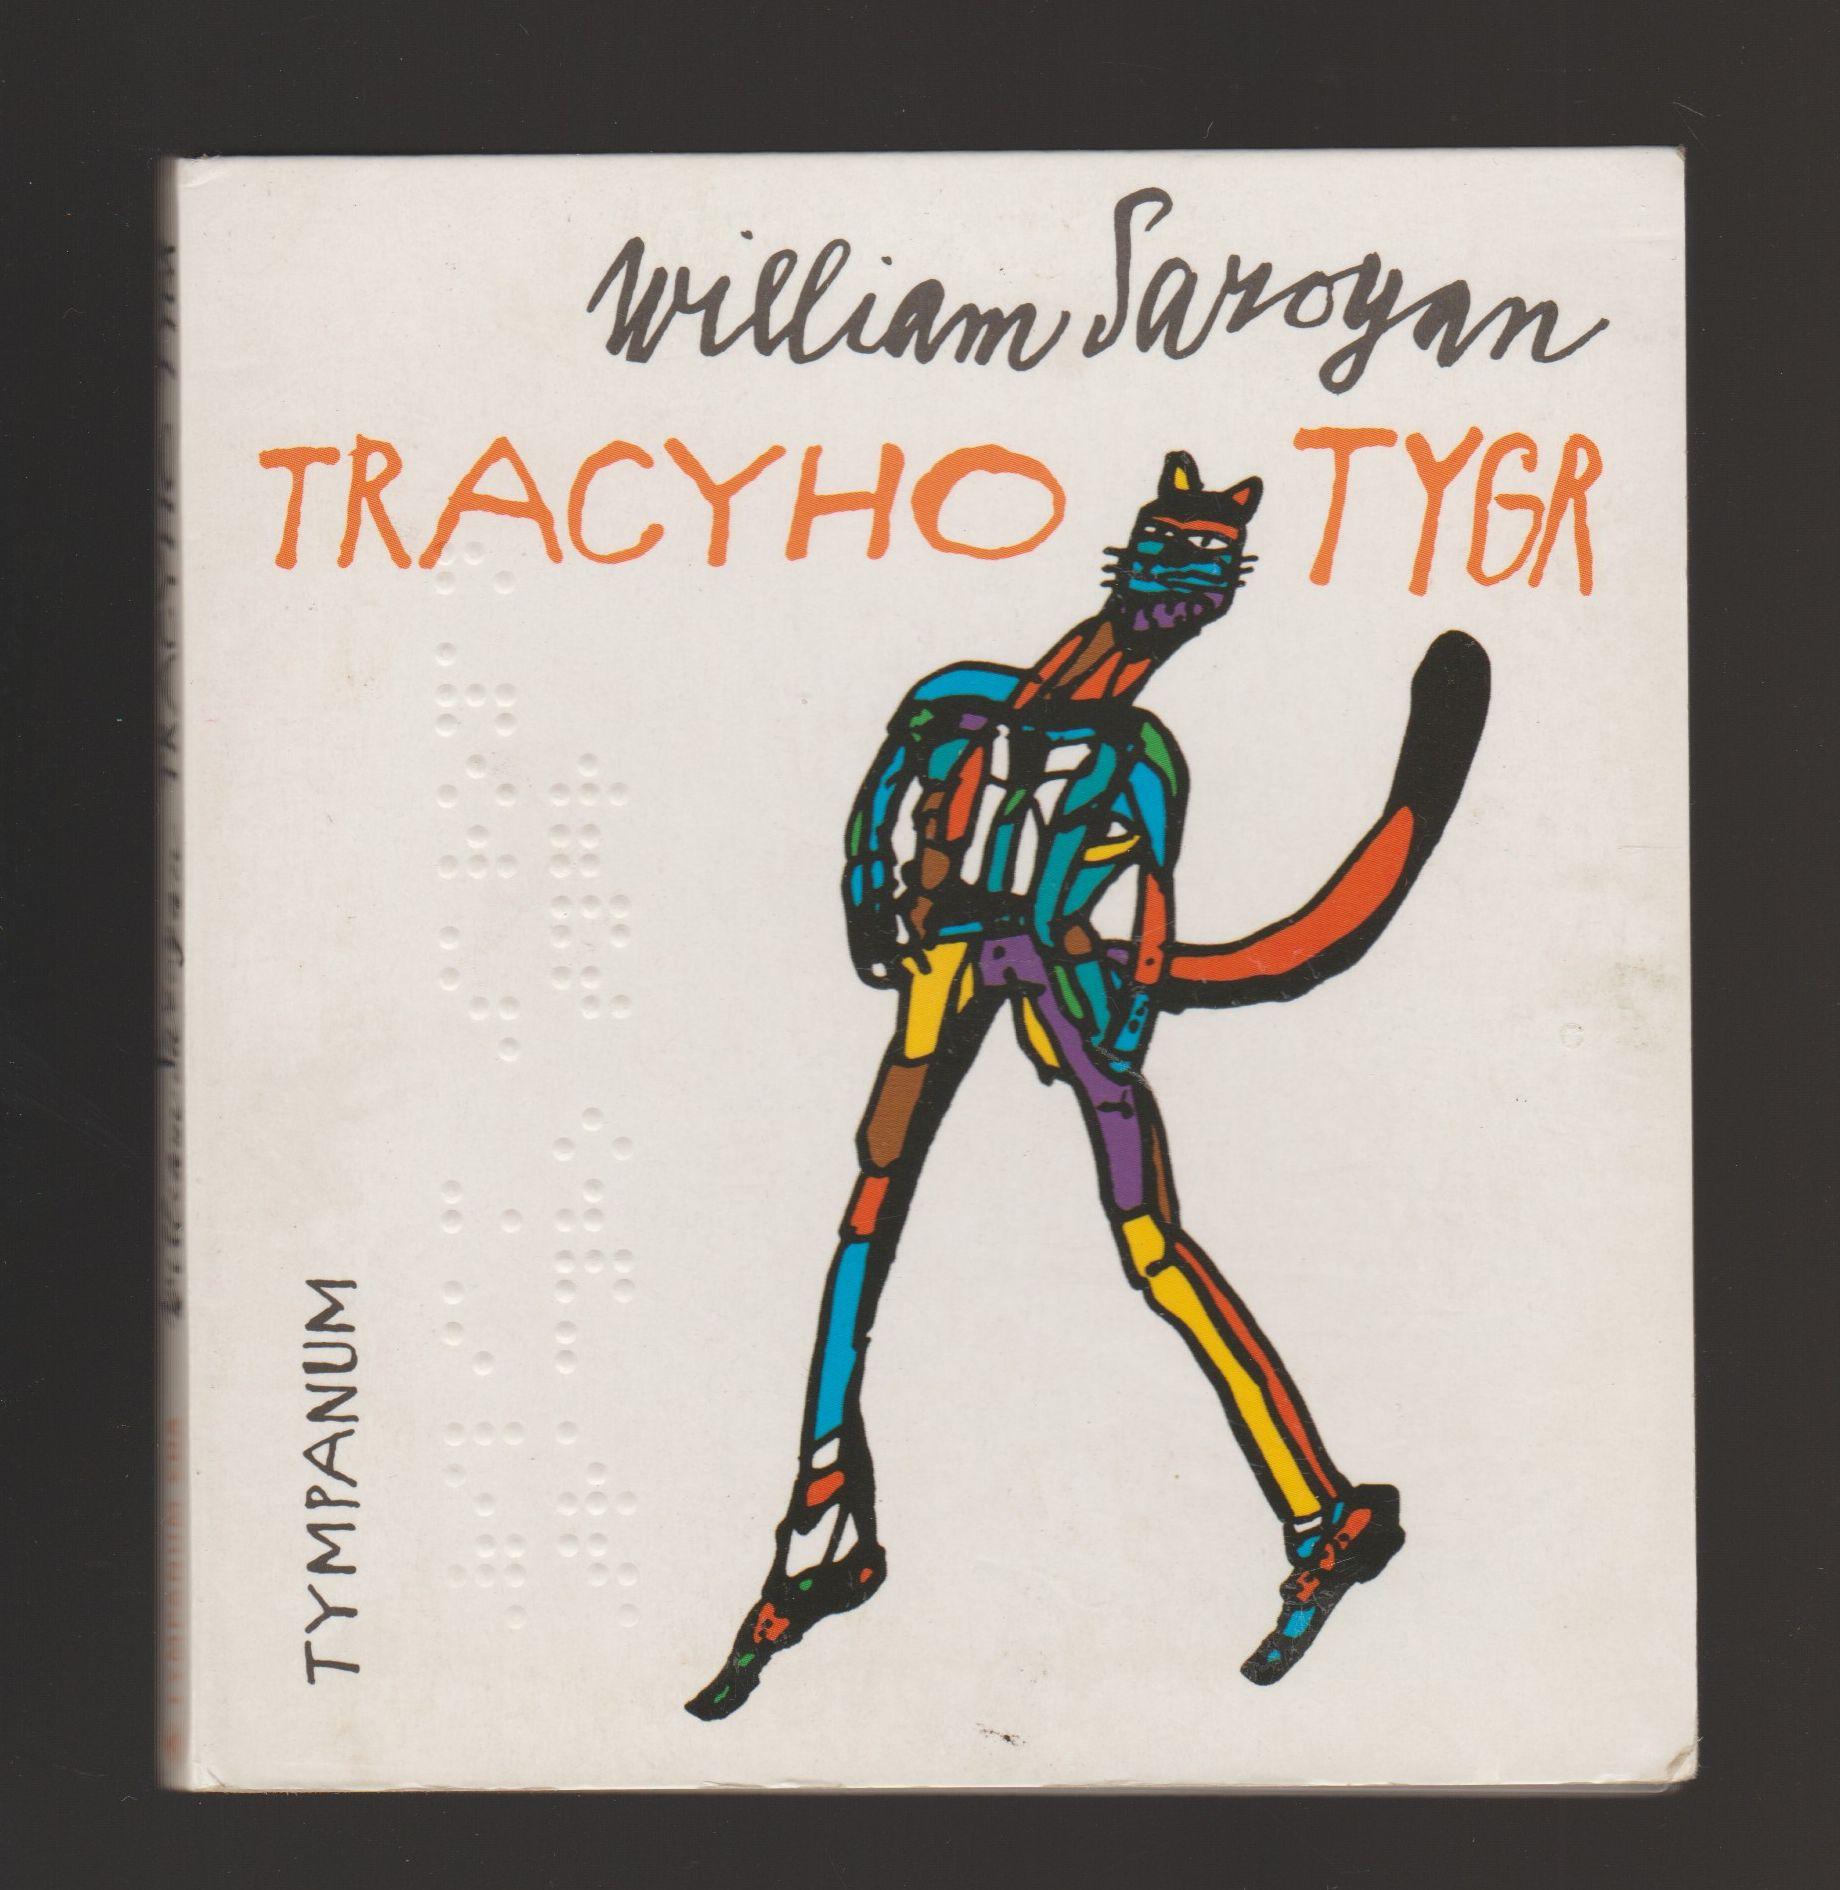 Tracyho tygr - William Saroyan - Audiokniha - 2 CD